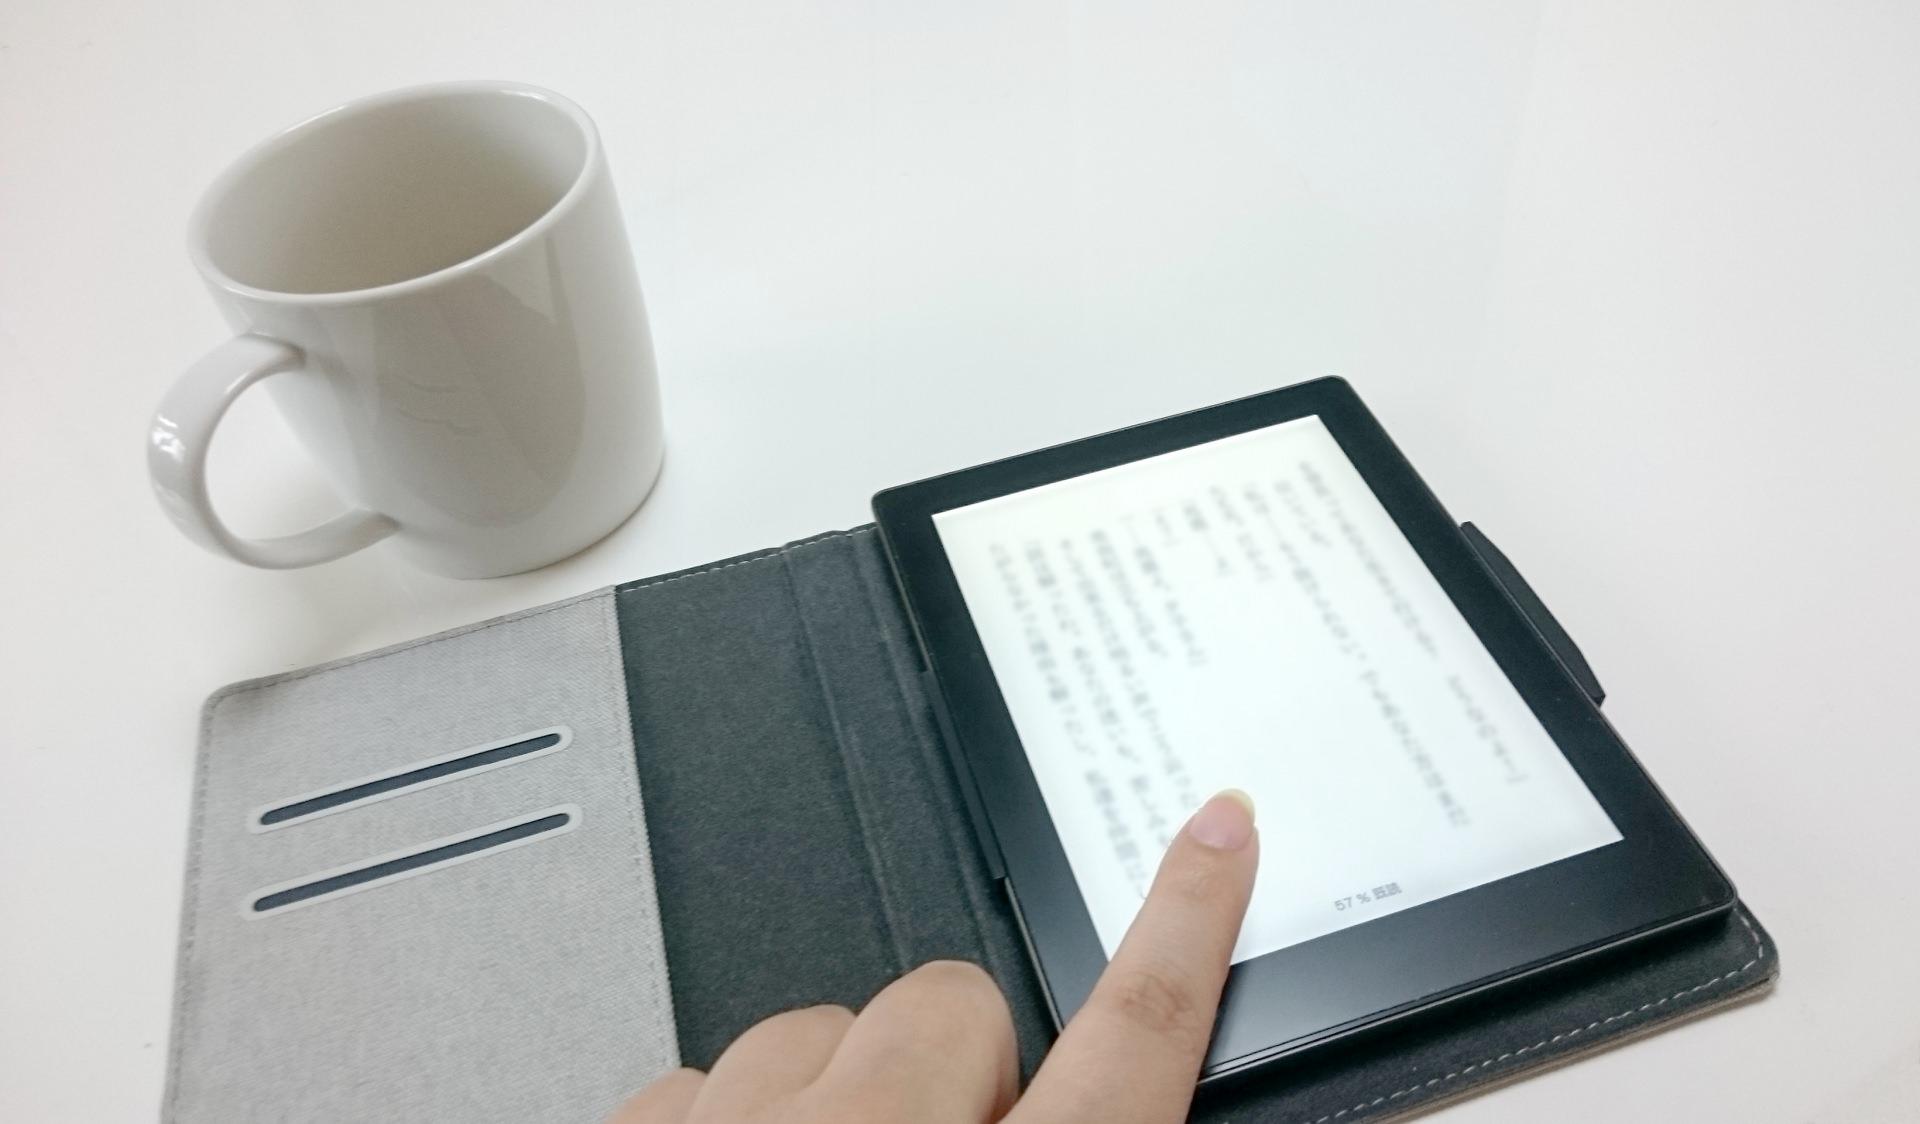 Amazonプライム会員「Kindle」「Kindle Paperwhite」を4,000円引きで買えて安い!クーポンの使い方・利用方法も解説!